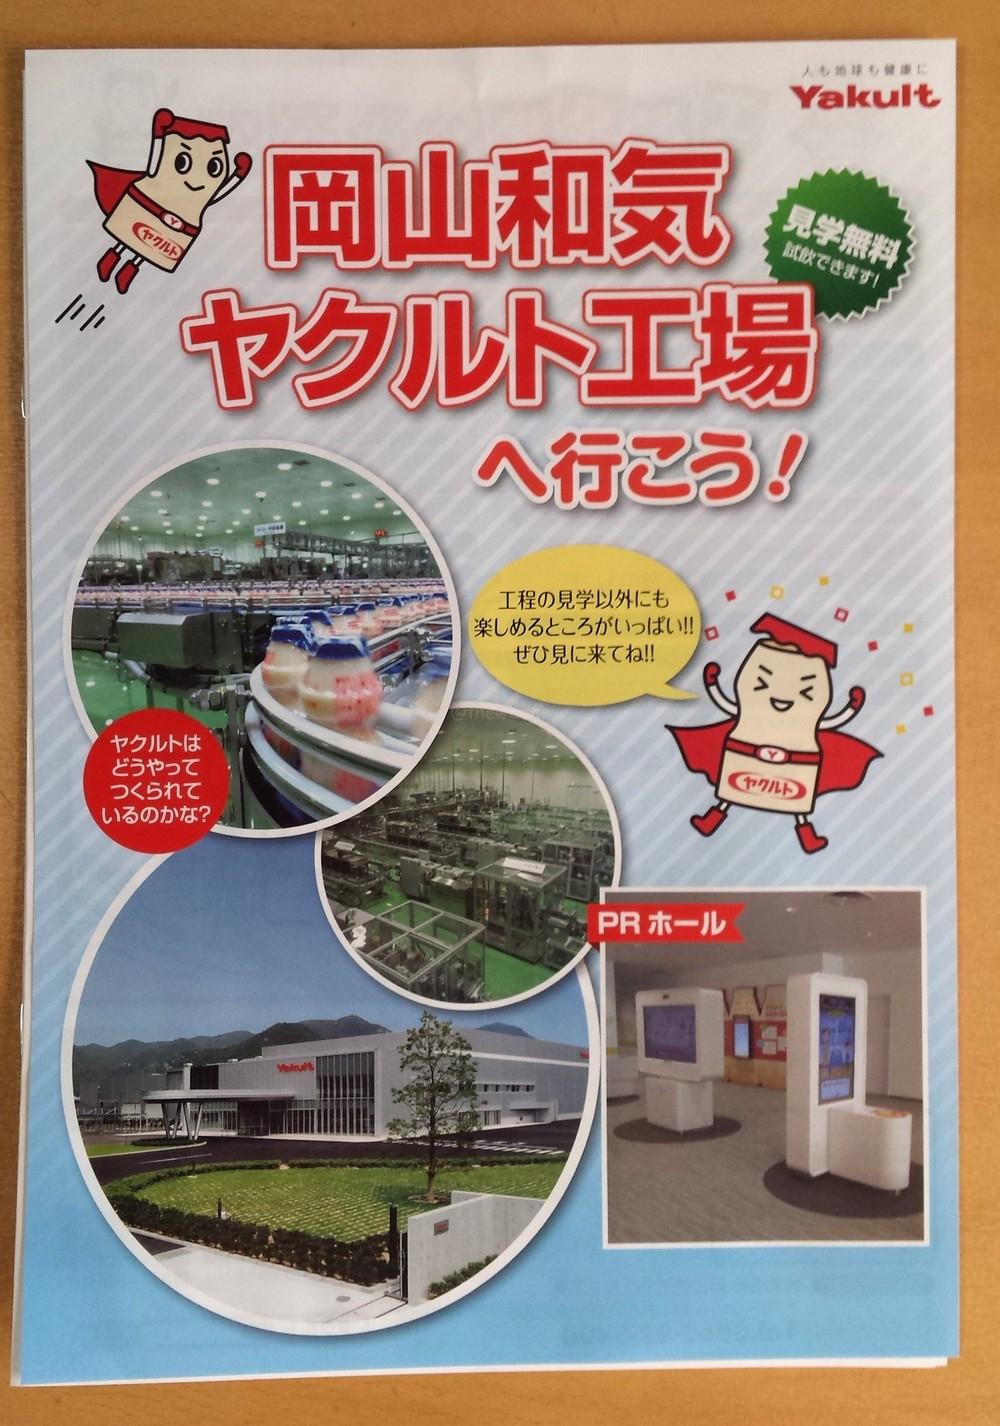 Yakult factory tour in Wake town Okayama